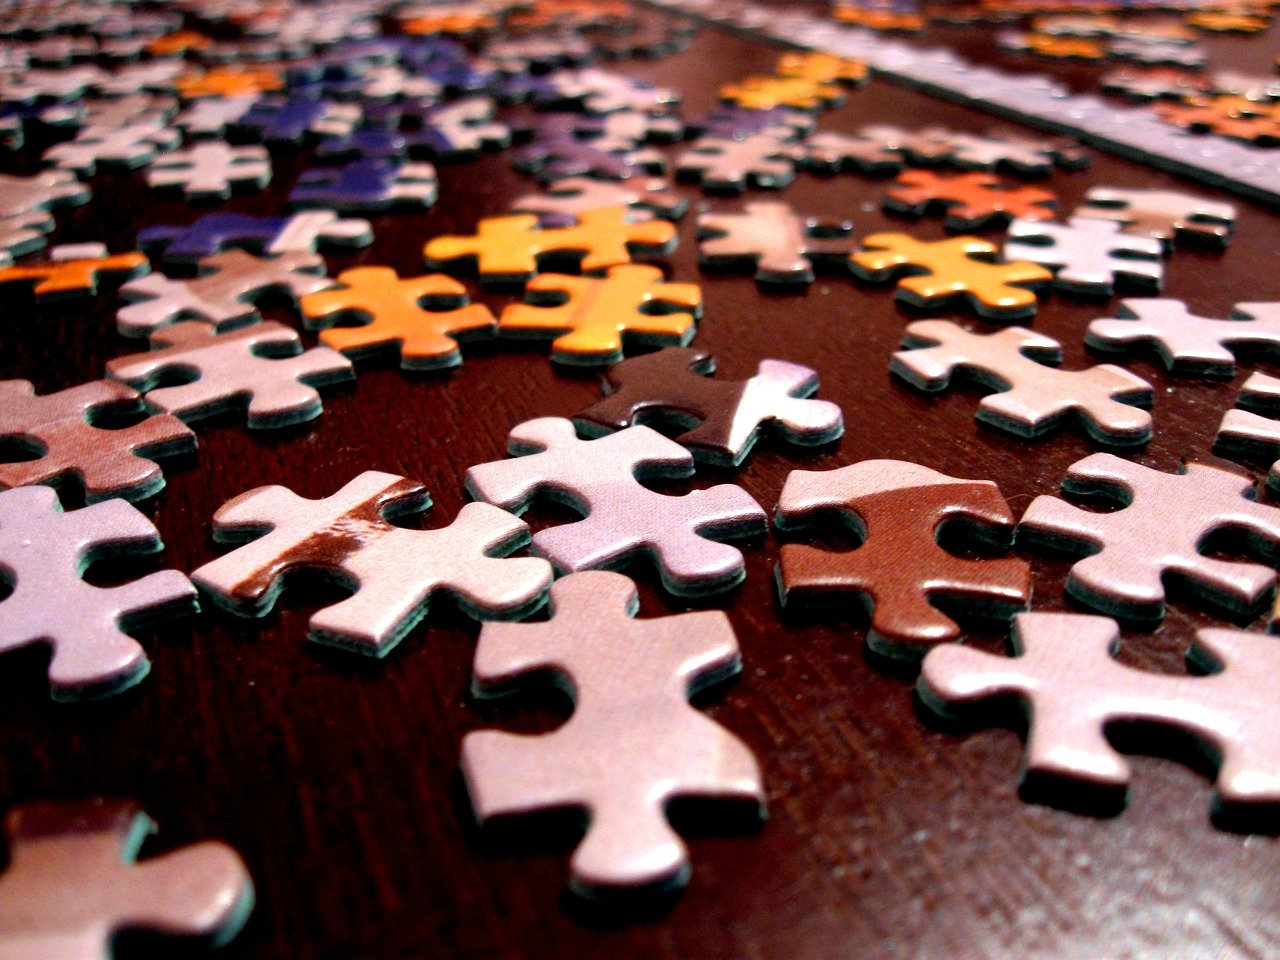 Puzzels 1000 stukjes online kopen